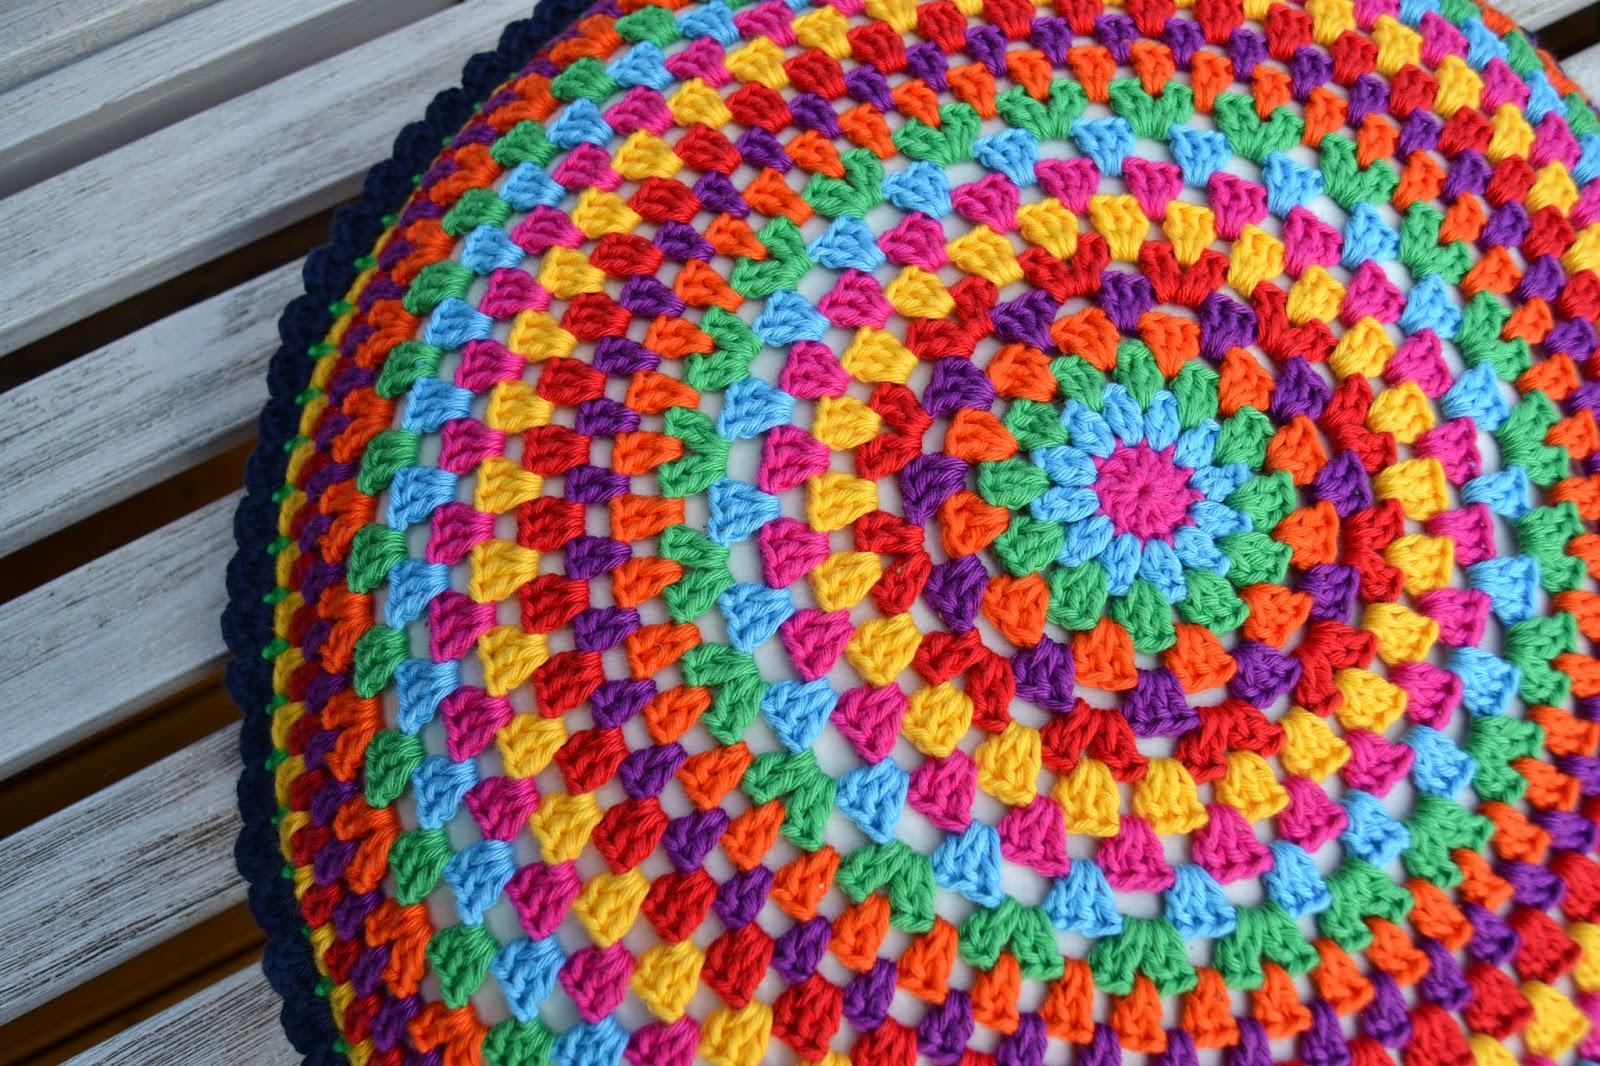 atelier marie lucienne h keln crochet. Black Bedroom Furniture Sets. Home Design Ideas